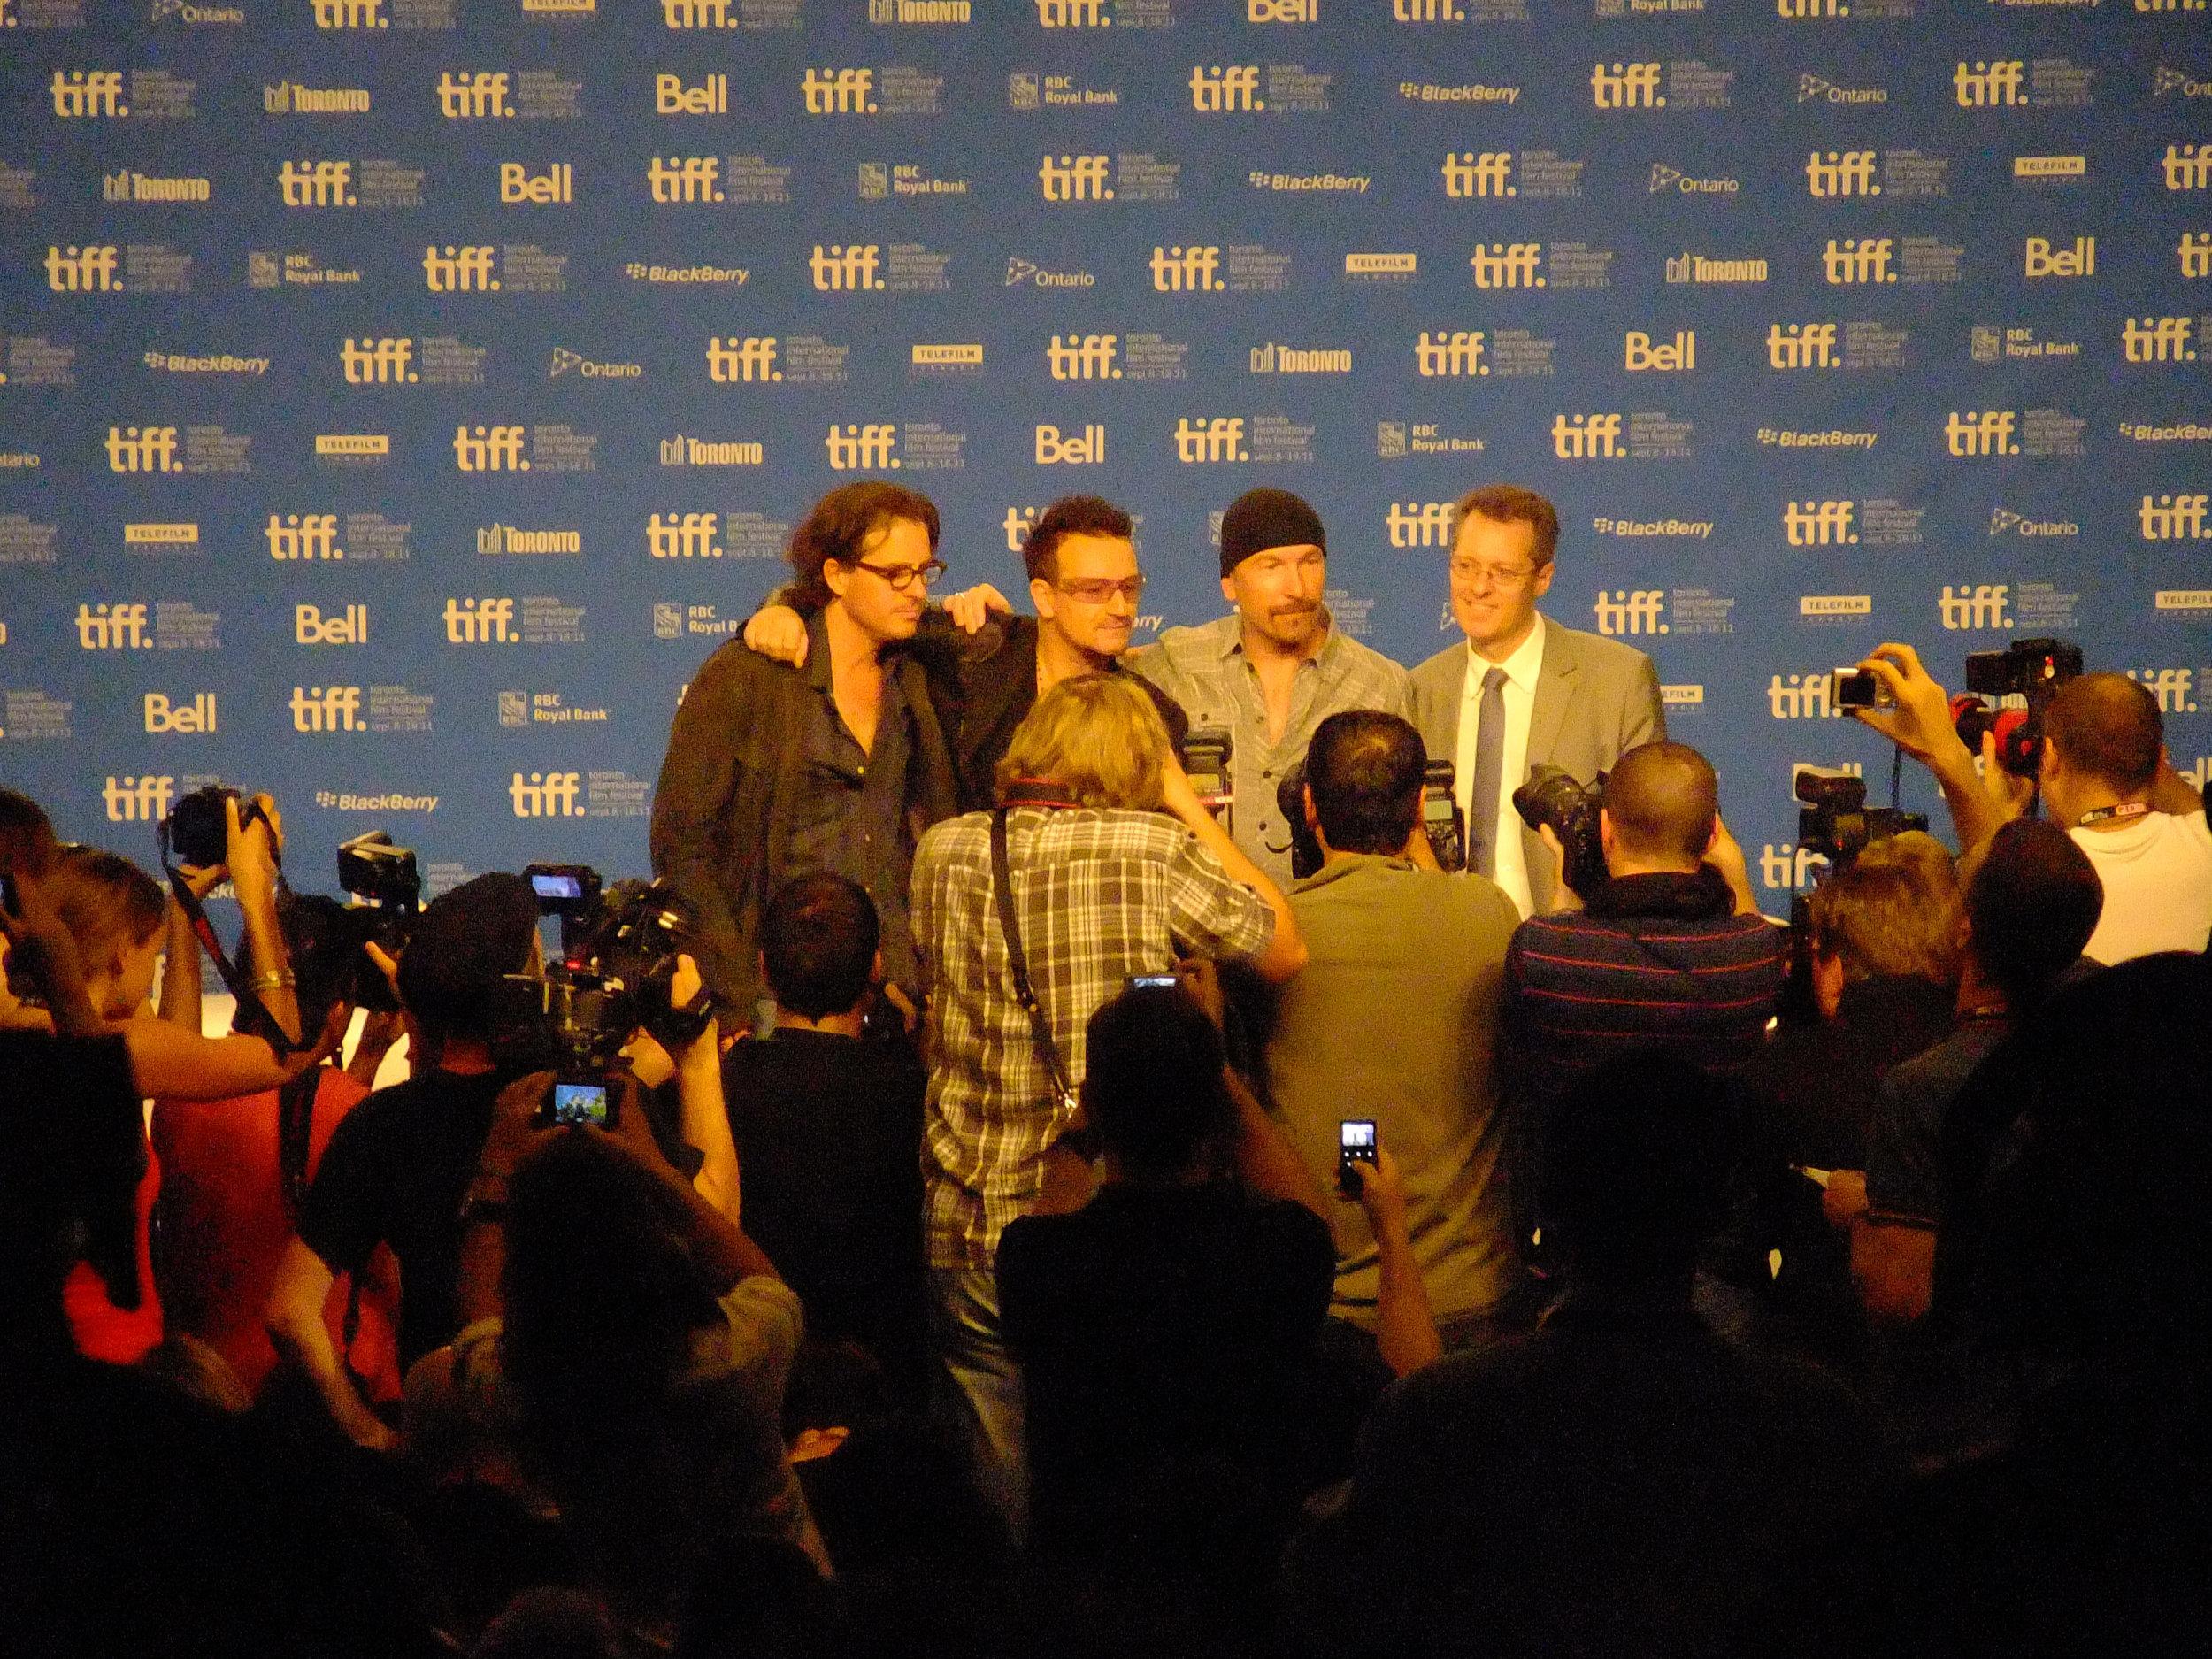 Media set in use by Bono & U2